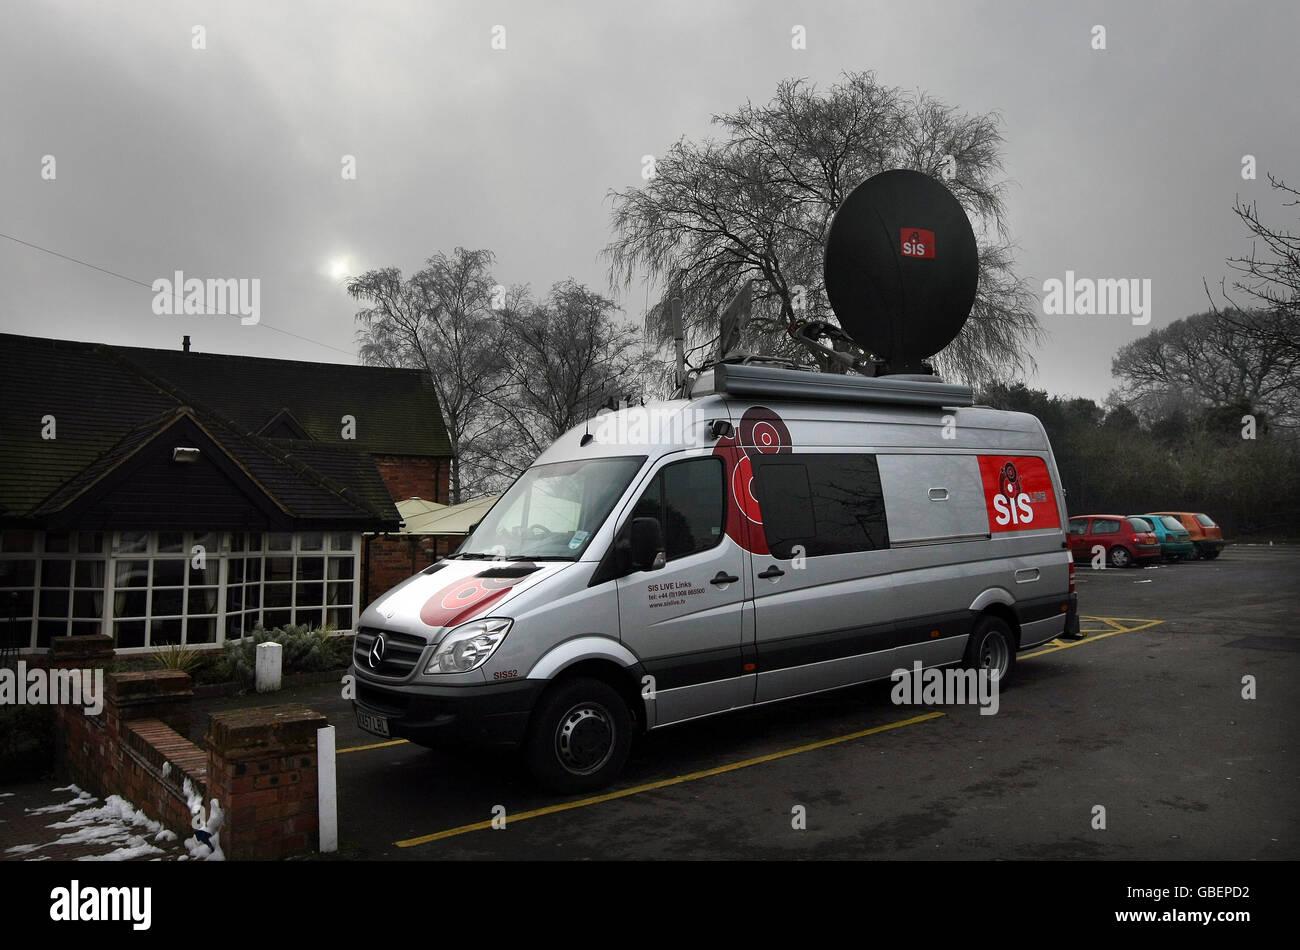 TV Broadcast vehicles - Stock Image